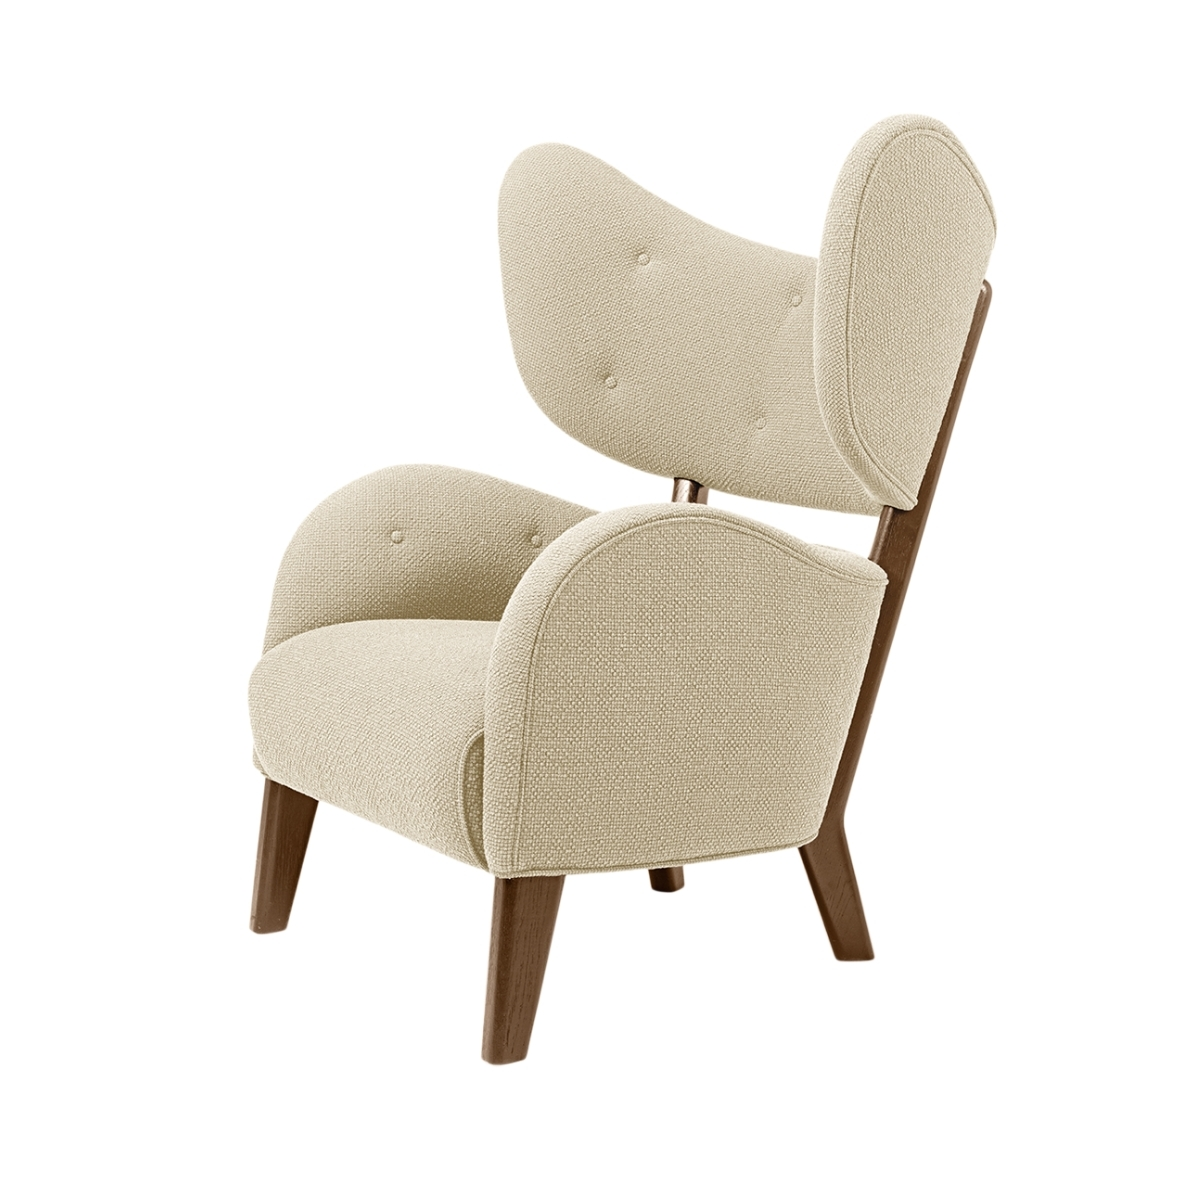 By Lassen | My Own Chair - Sahco Zero - Bolighuset Werenberg